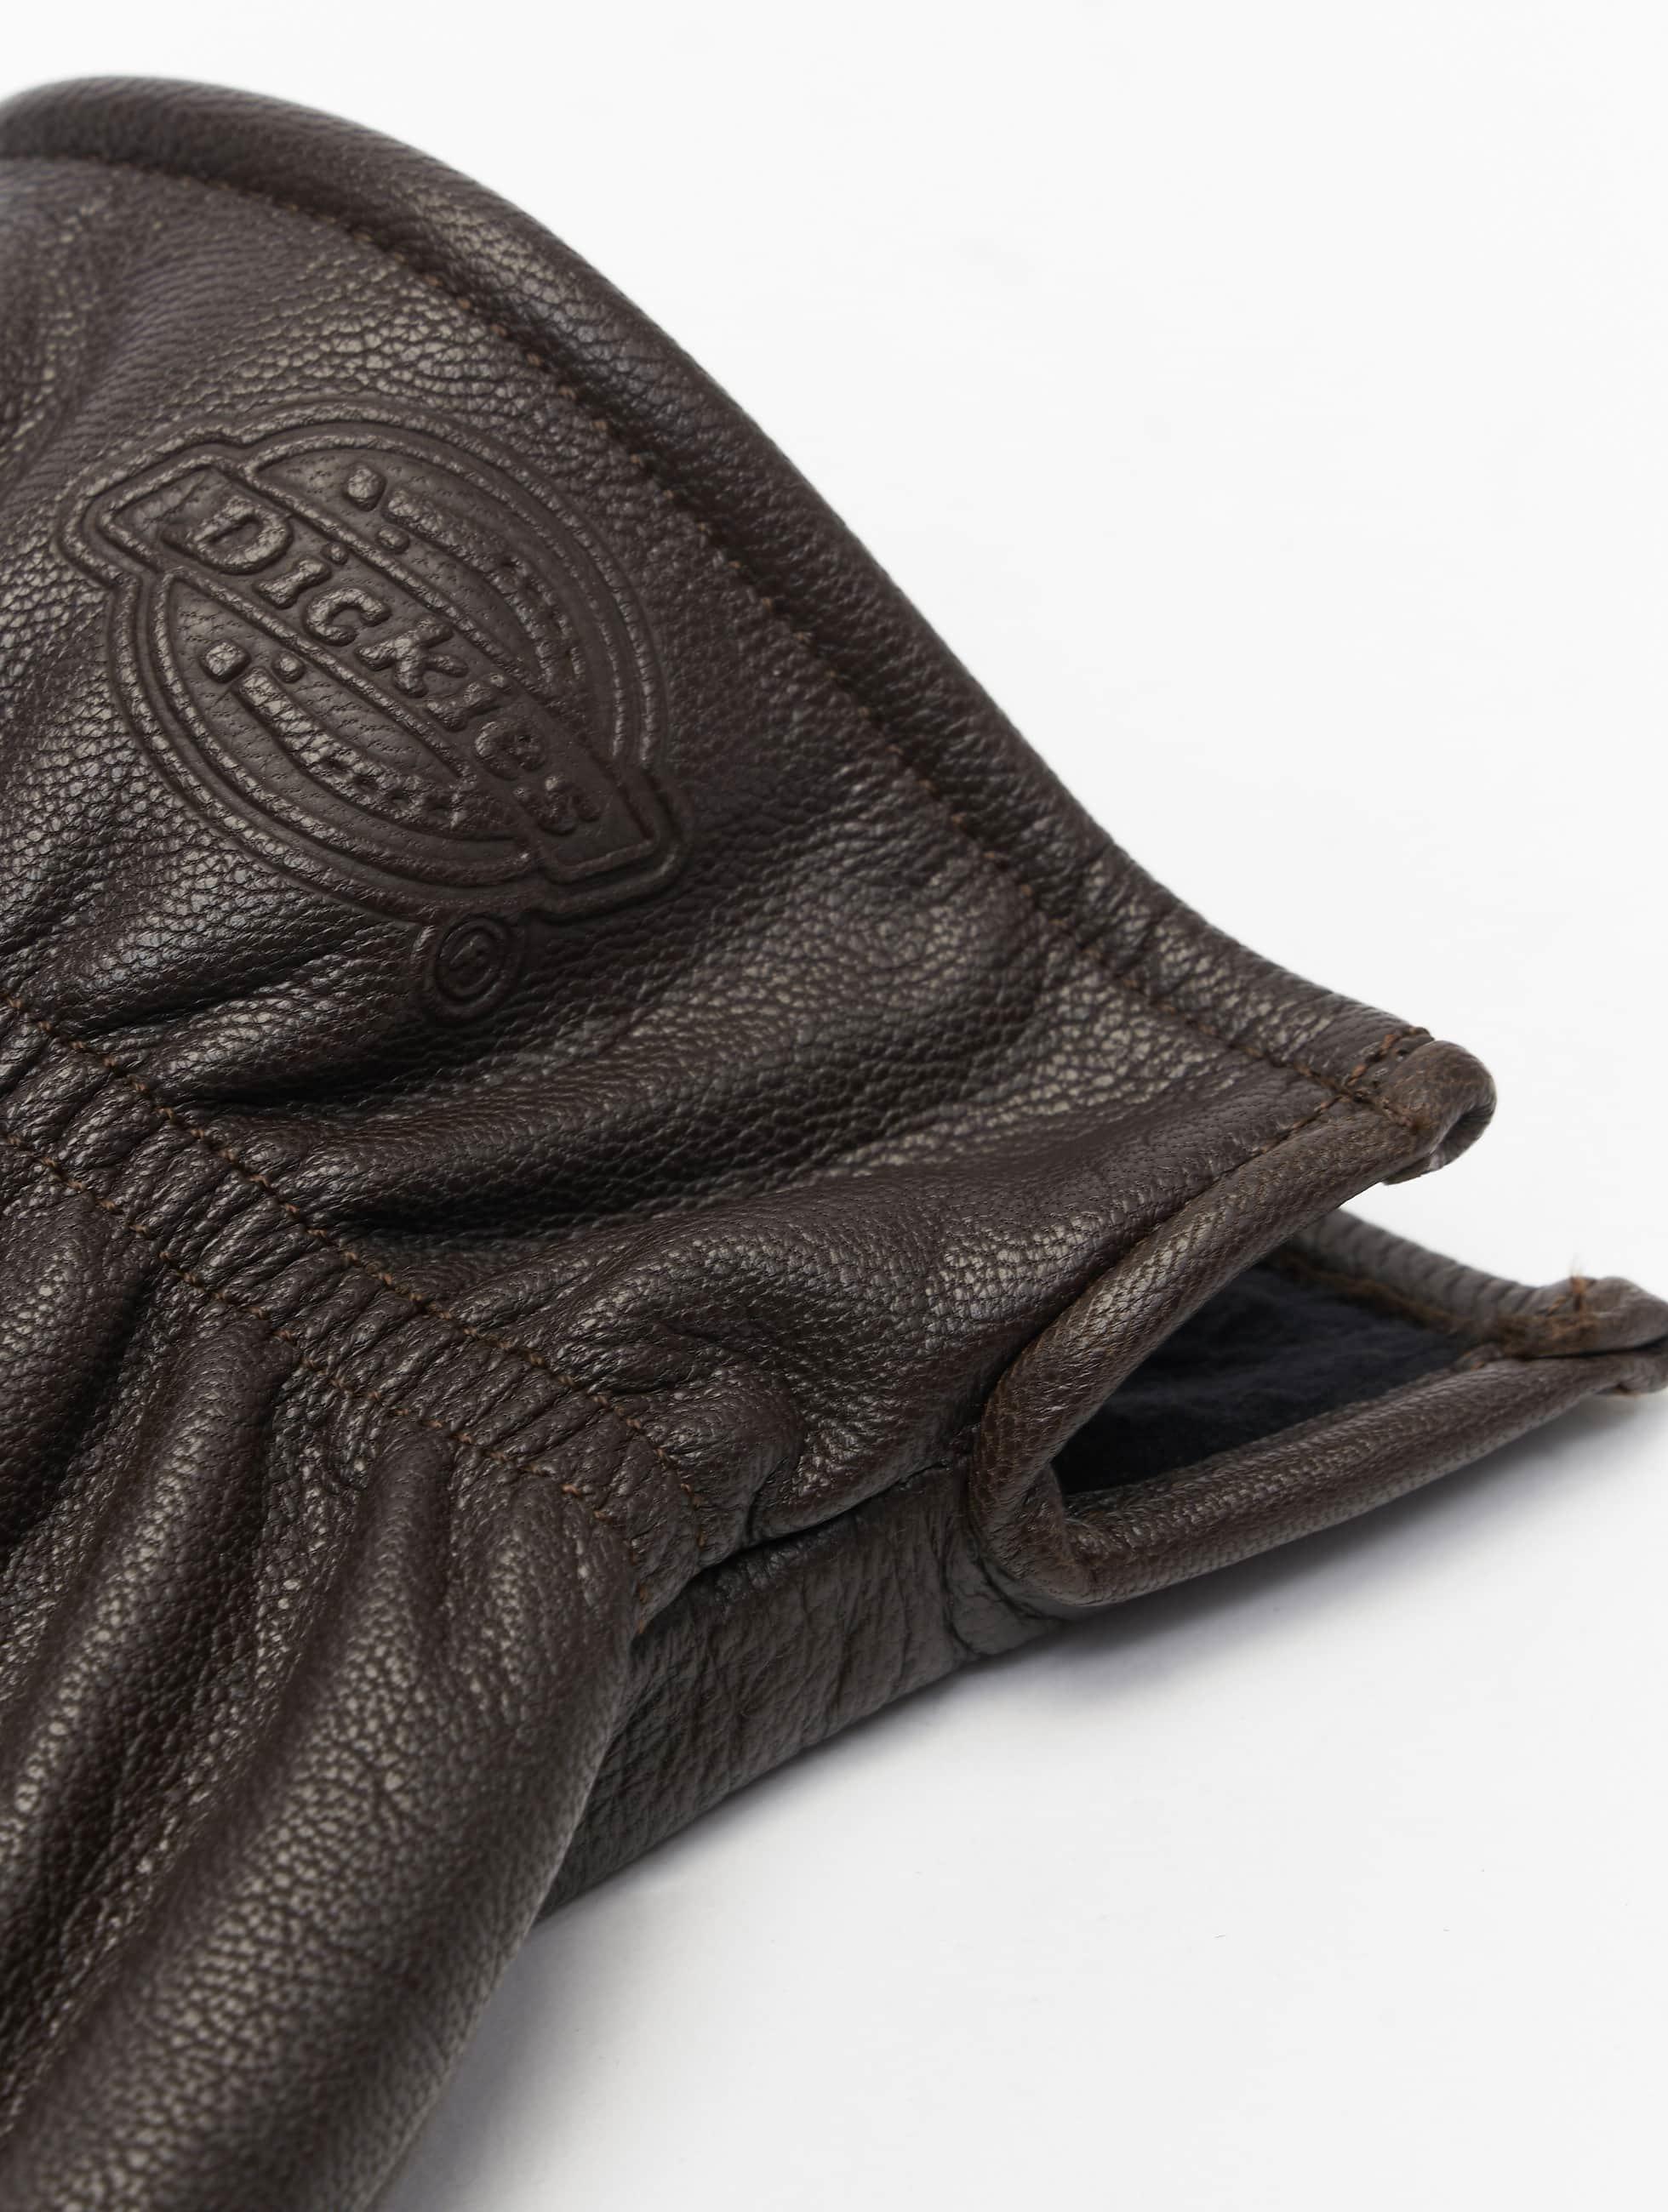 Dickies Handschuhe Memphis braun